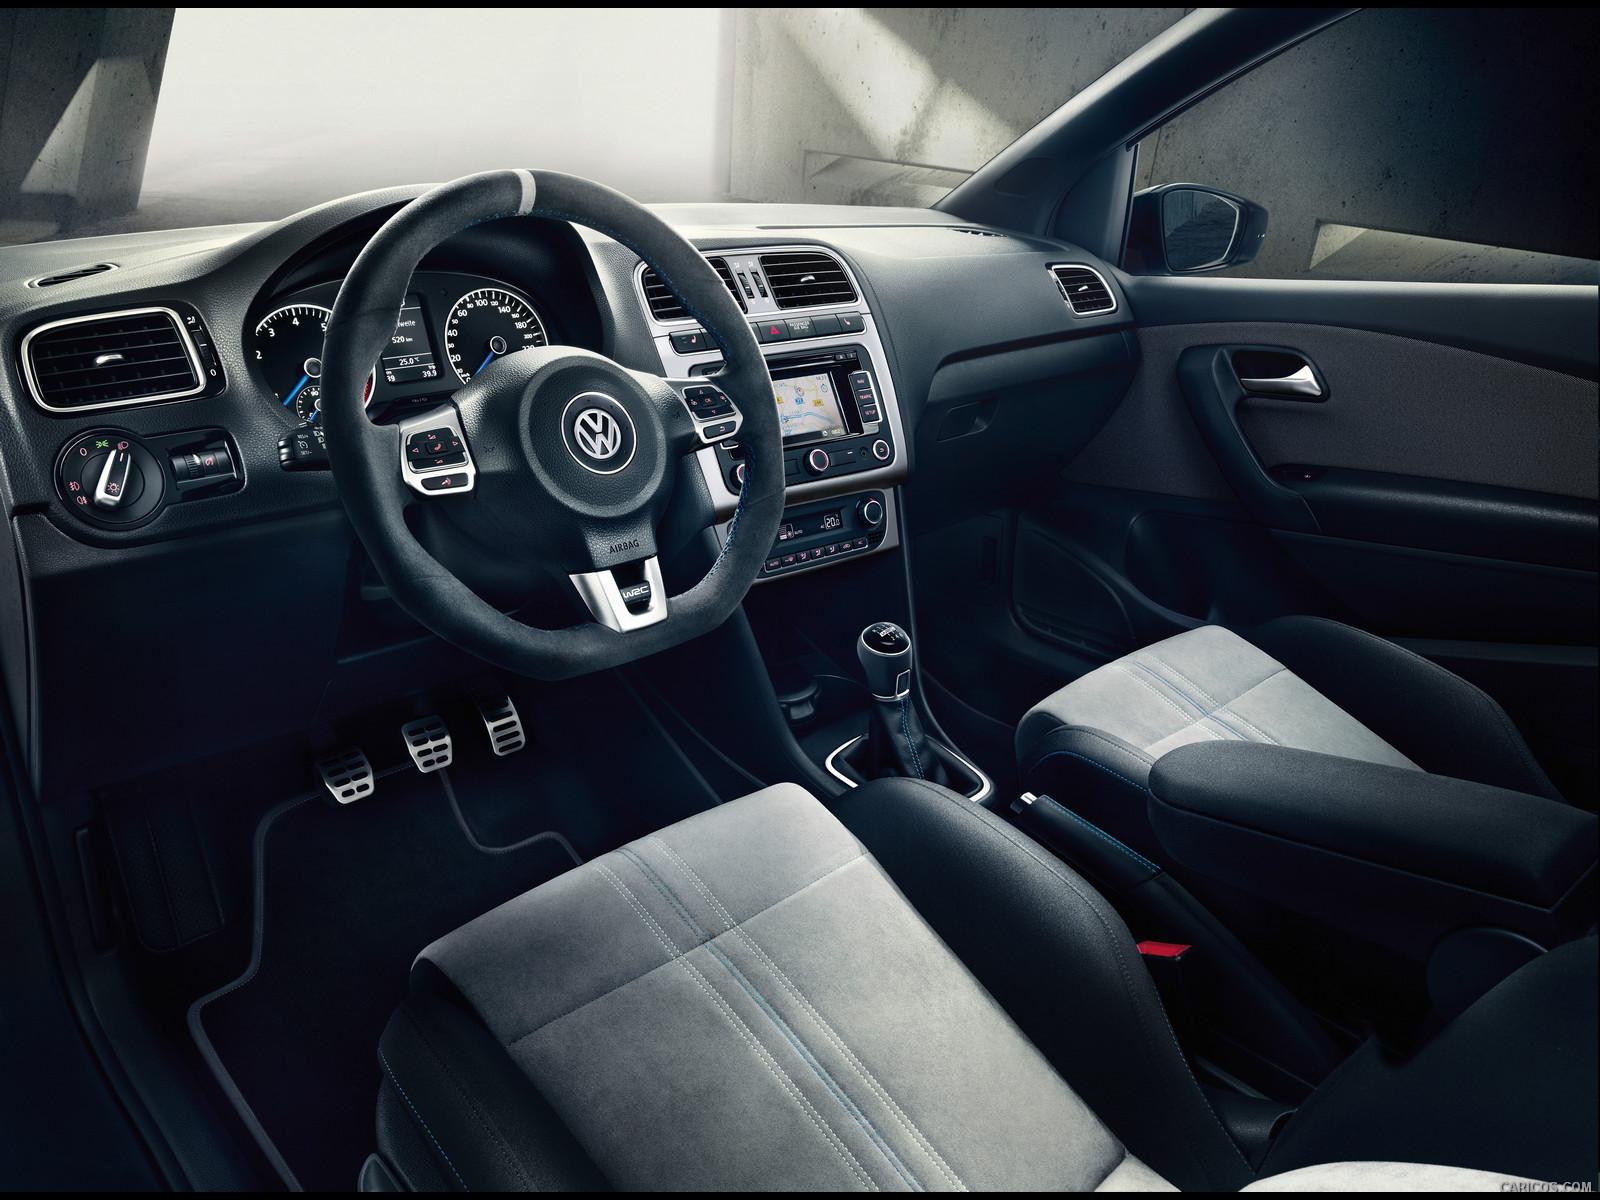 2013 Volkswagen Polo R WRC - Interior Wallpaper